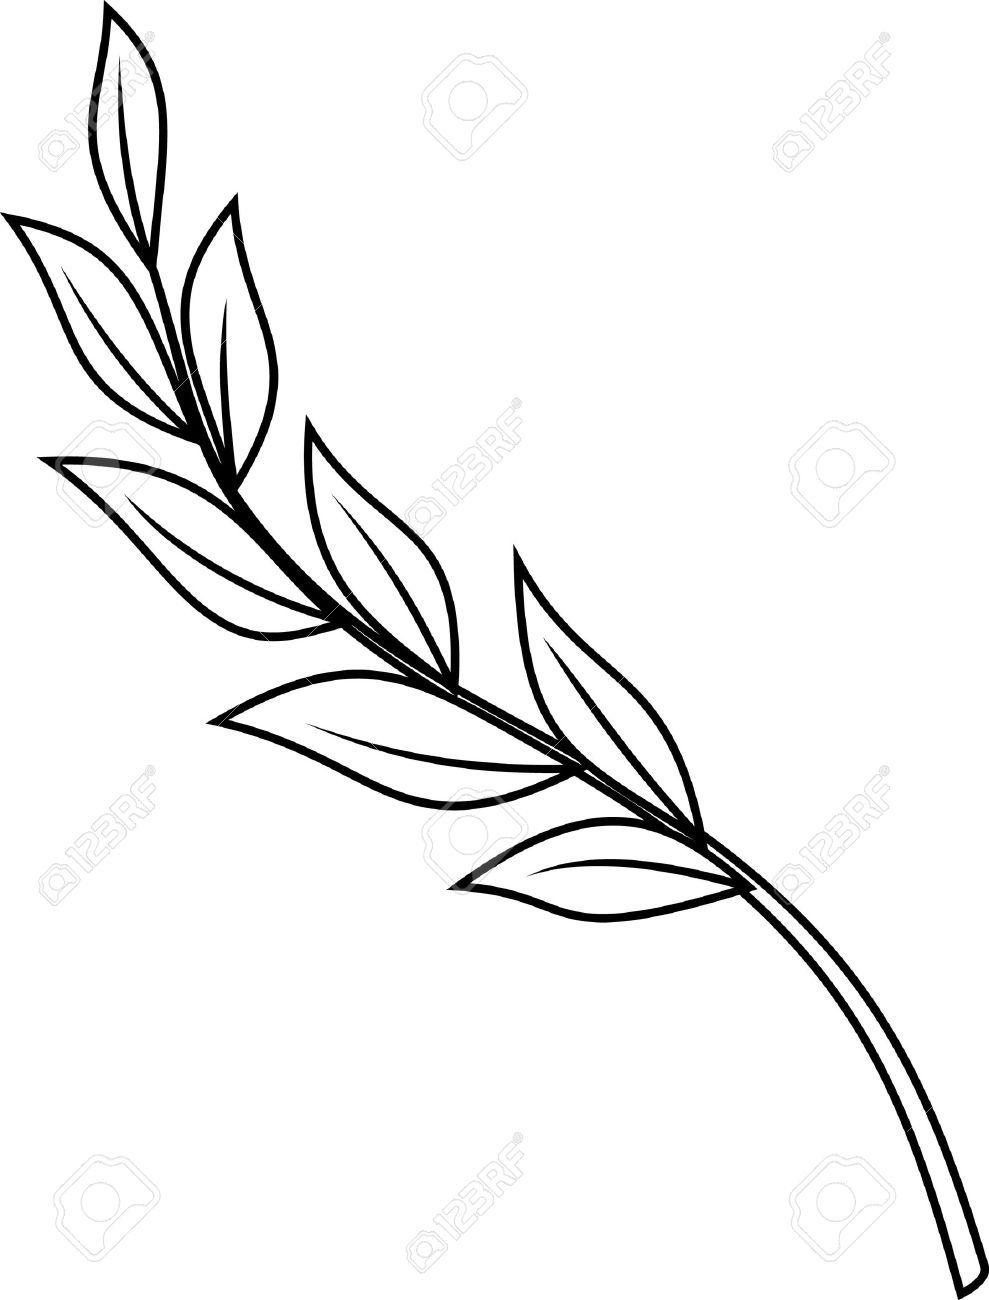 989x1300 laurel branch stock vector illustration and royalty free laurel